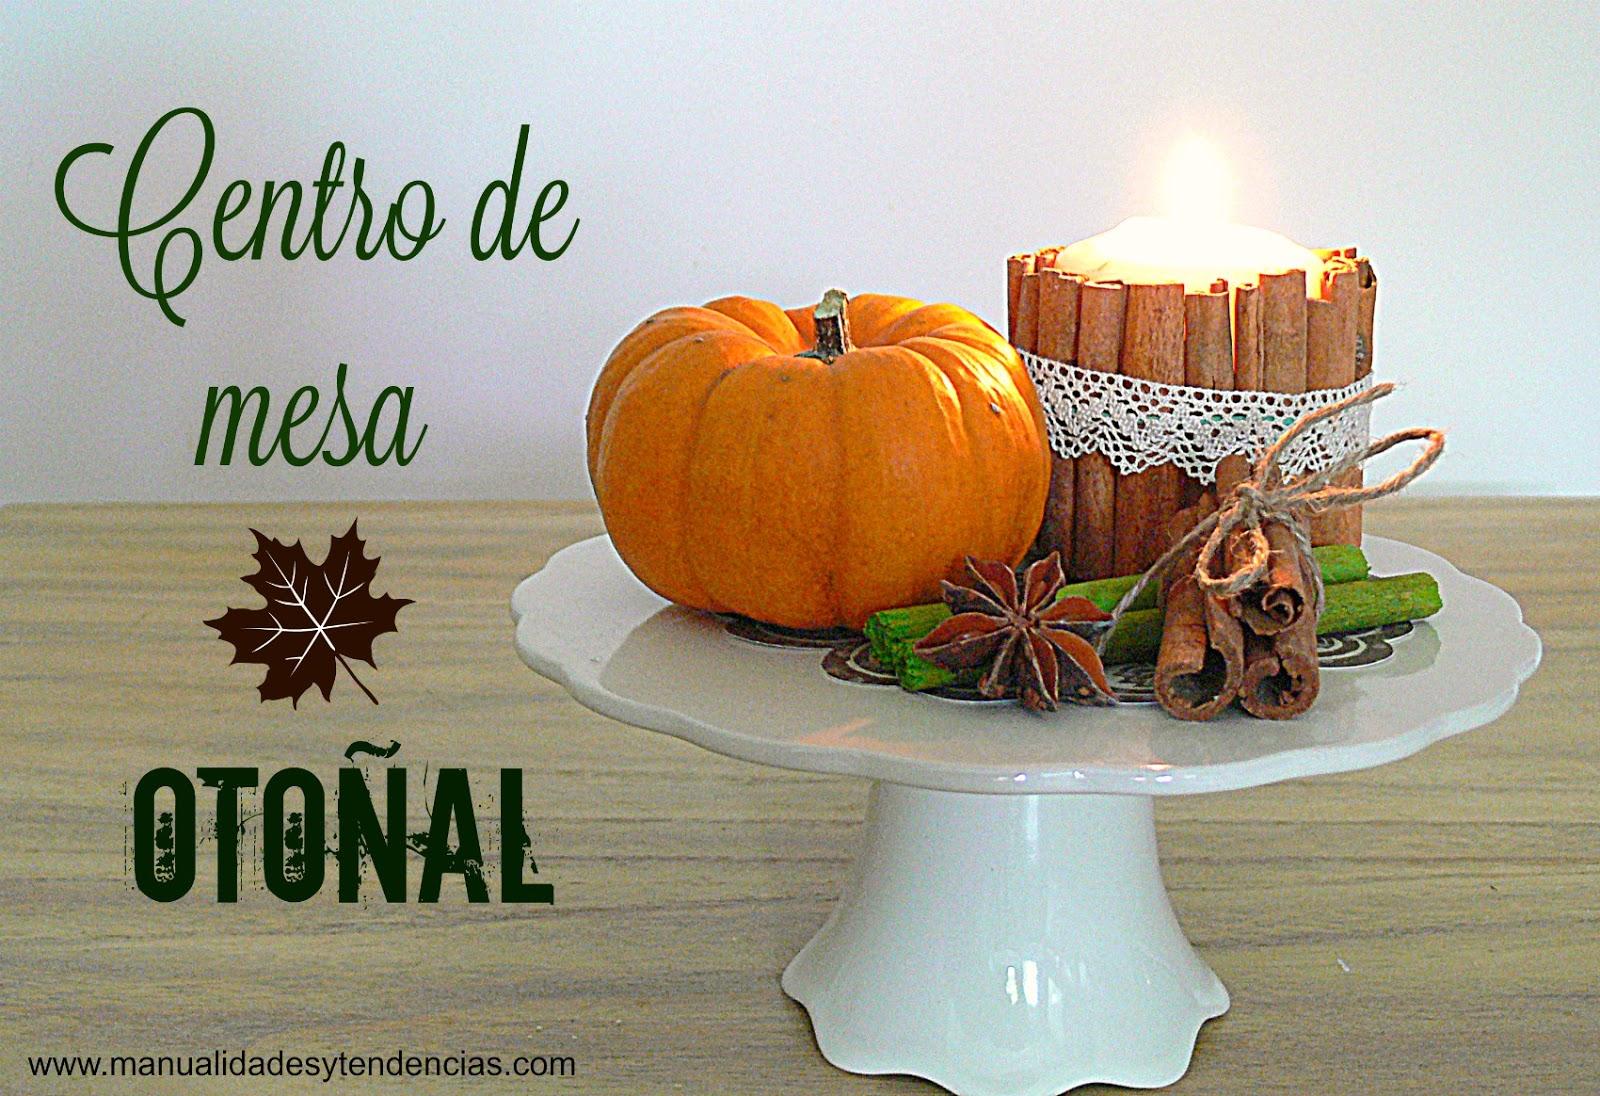 Manualidades y tendencias centro de mesa oto al casero autumn centerpiece - Centros de mesa caseros ...